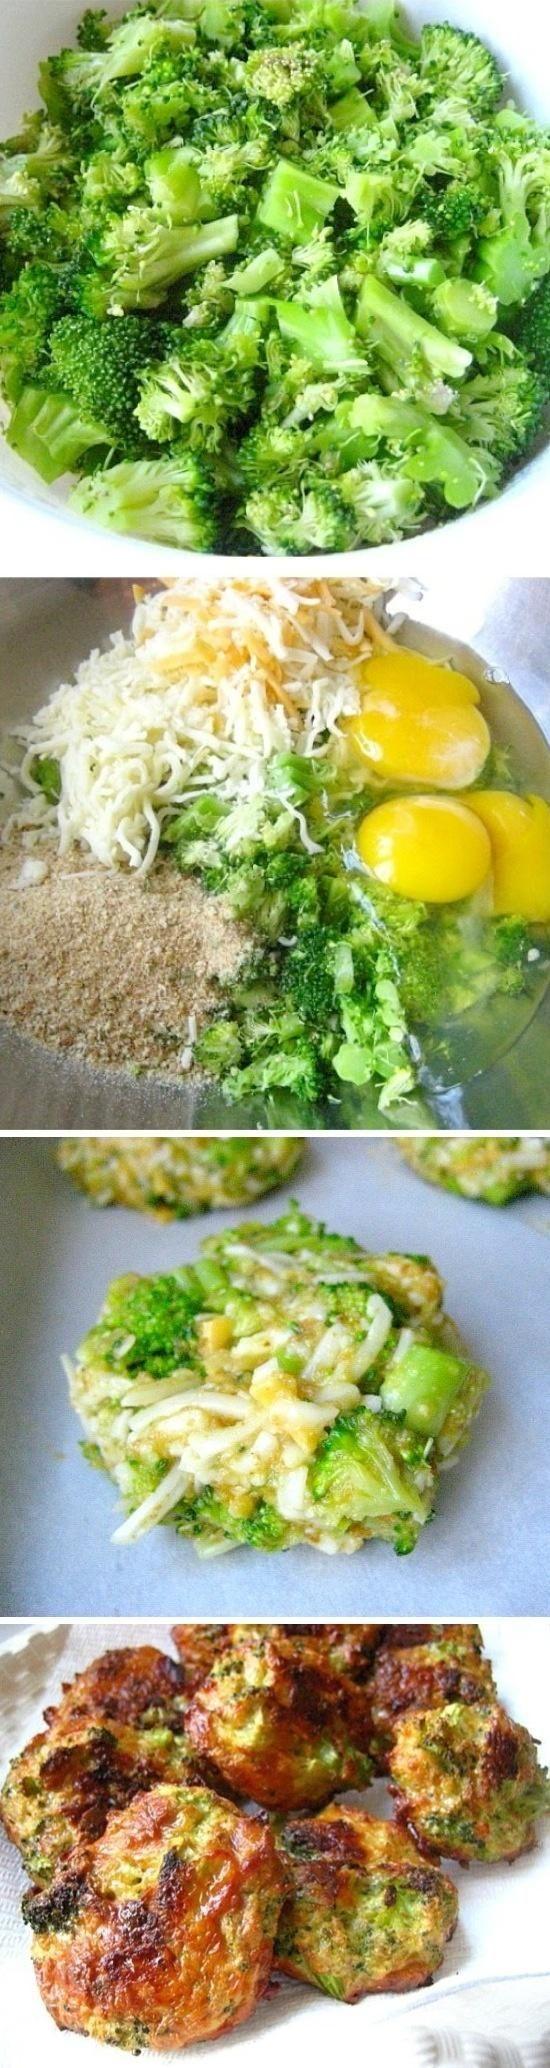 Broccoli Chees Bites Click For More!